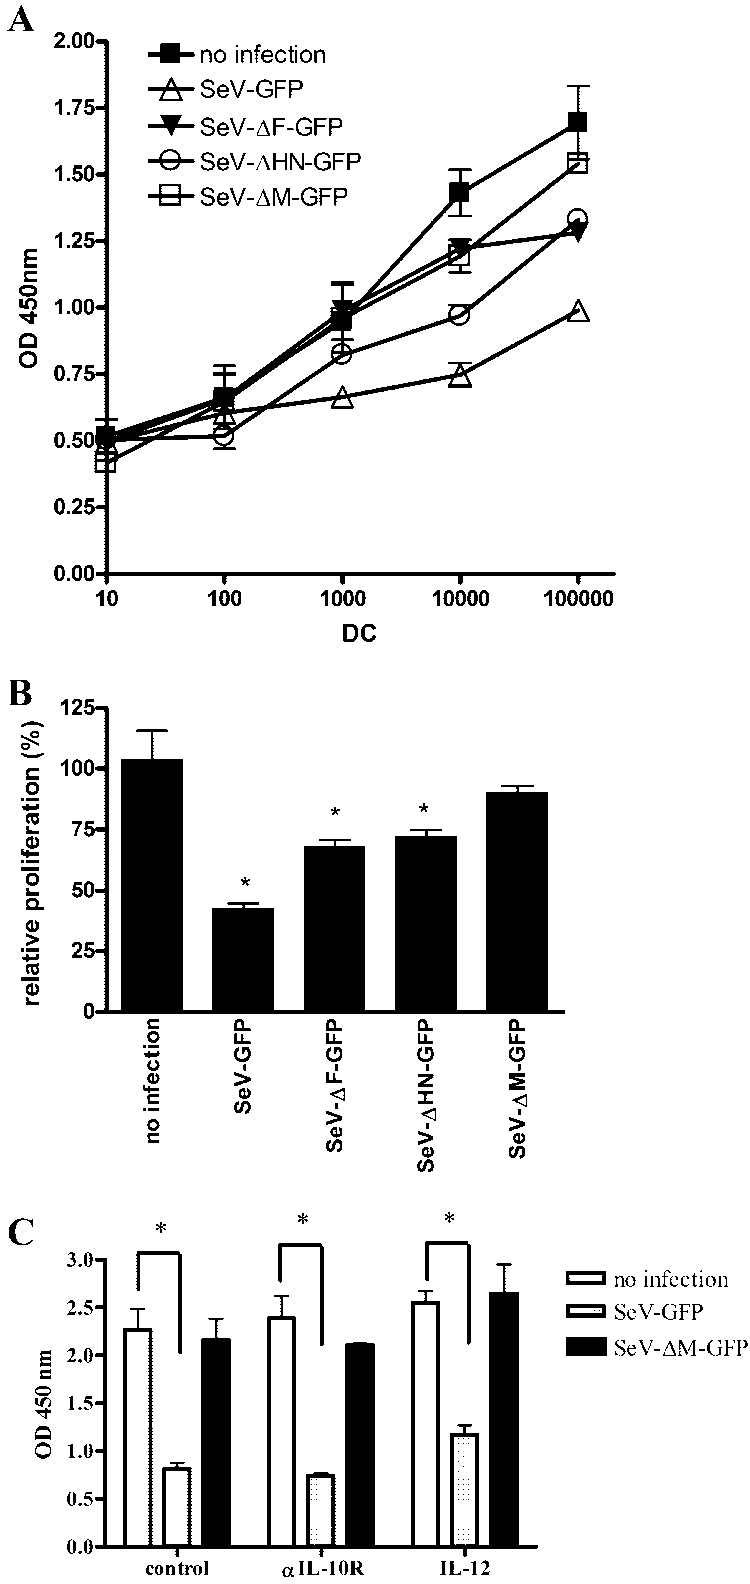 Regain of allostimulatory activity by using single gene